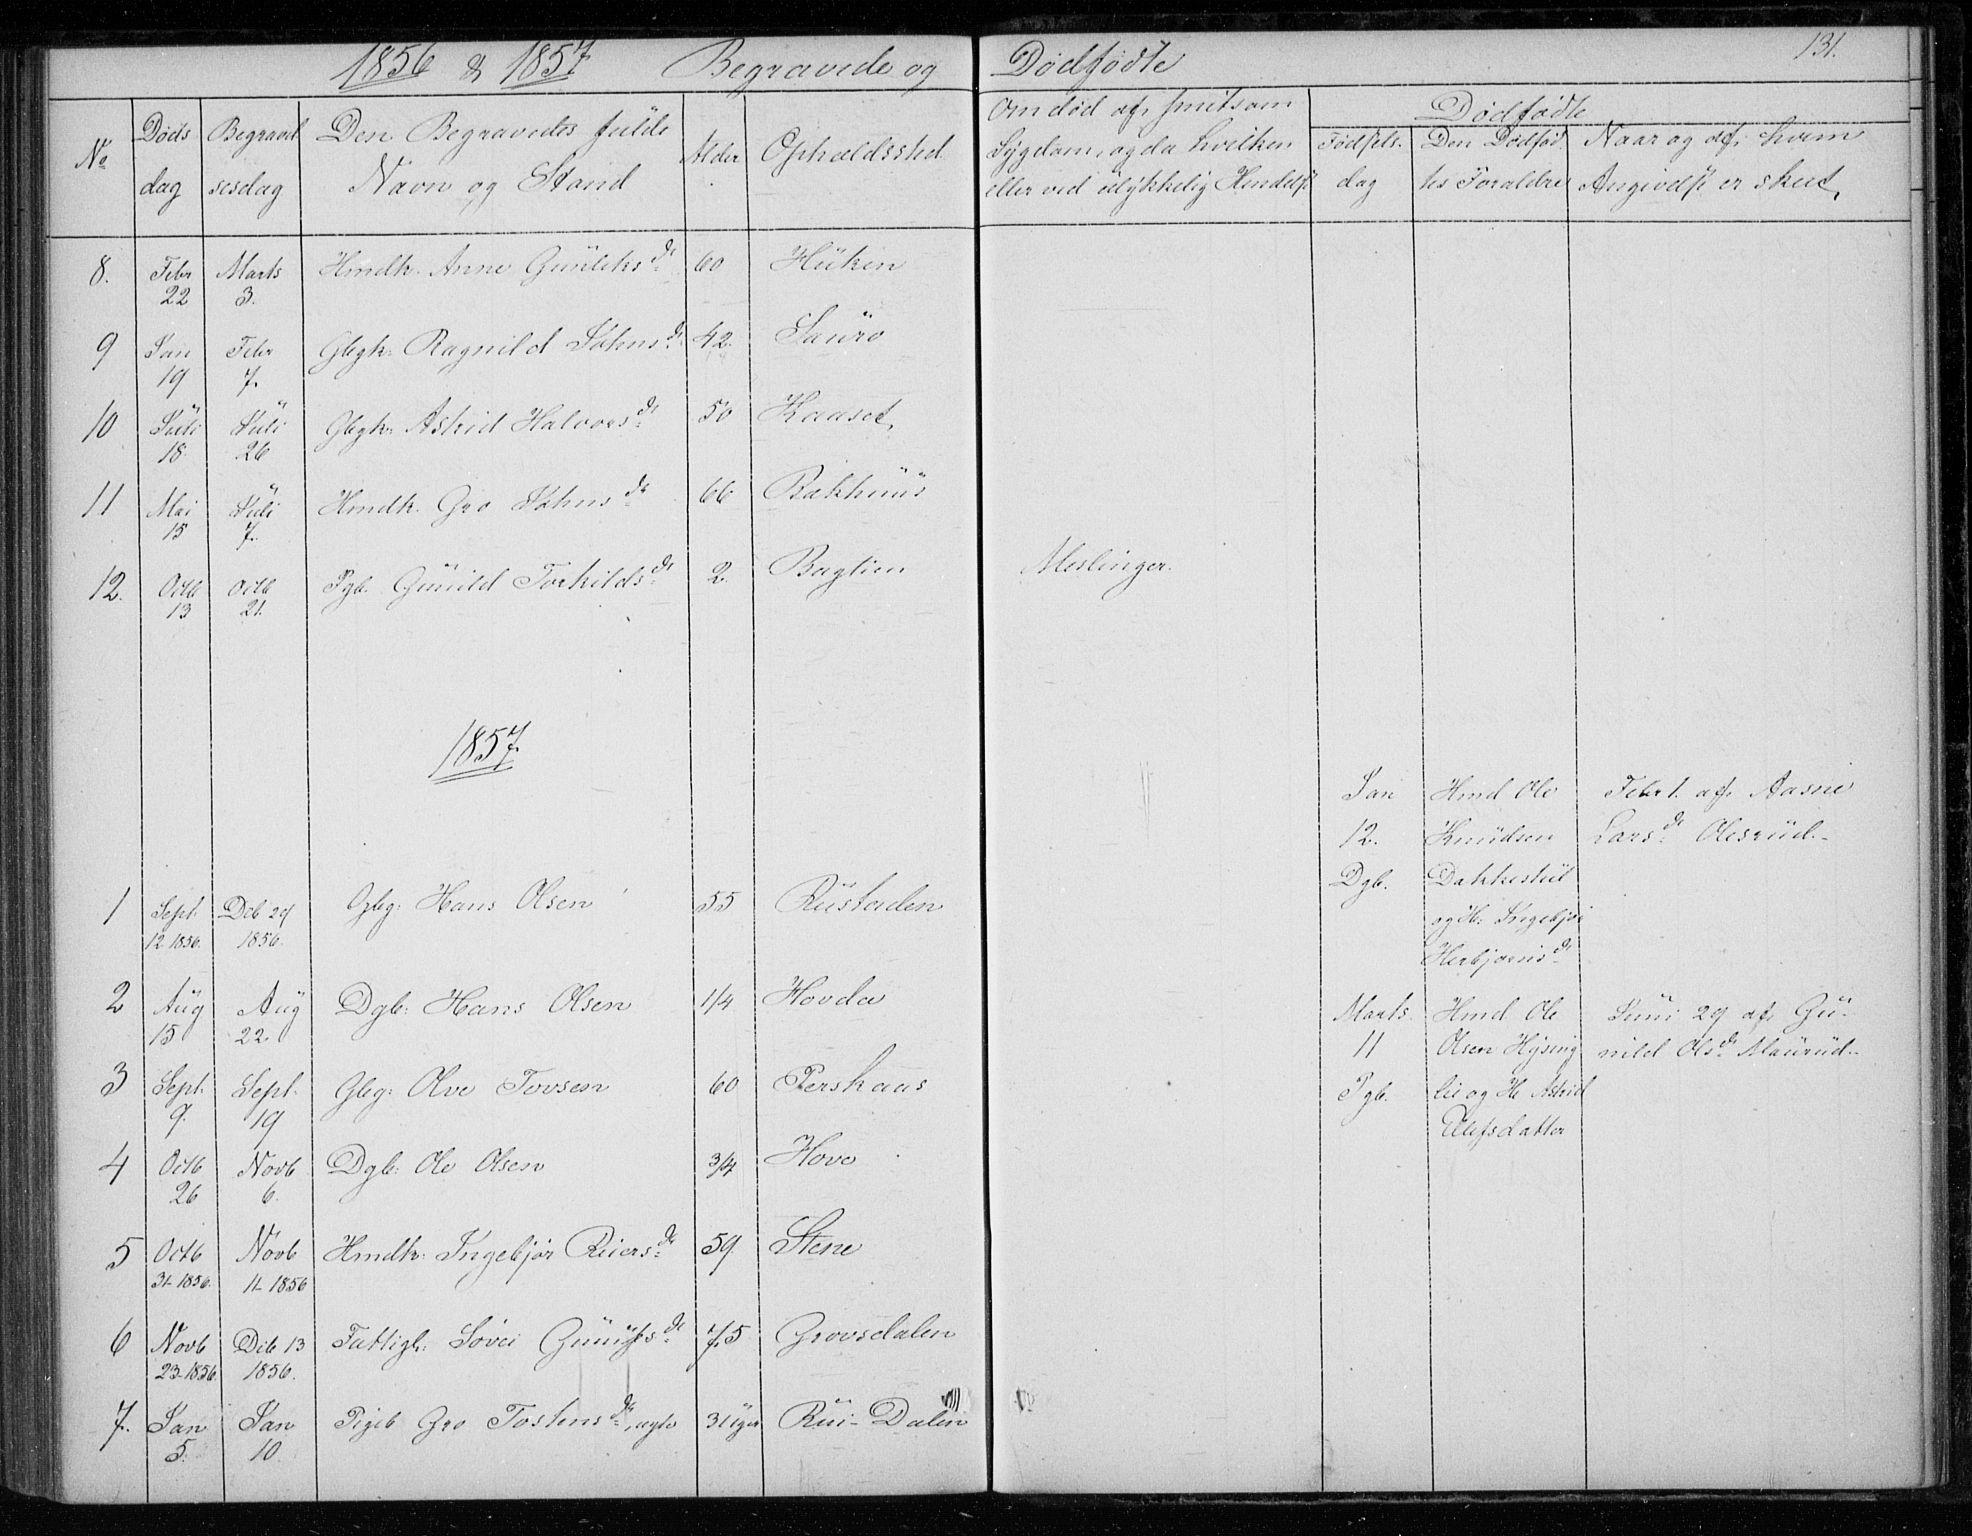 SAKO, Gransherad kirkebøker, F/Fb/L0003: Ministerialbok nr. II 3, 1844-1859, s. 131